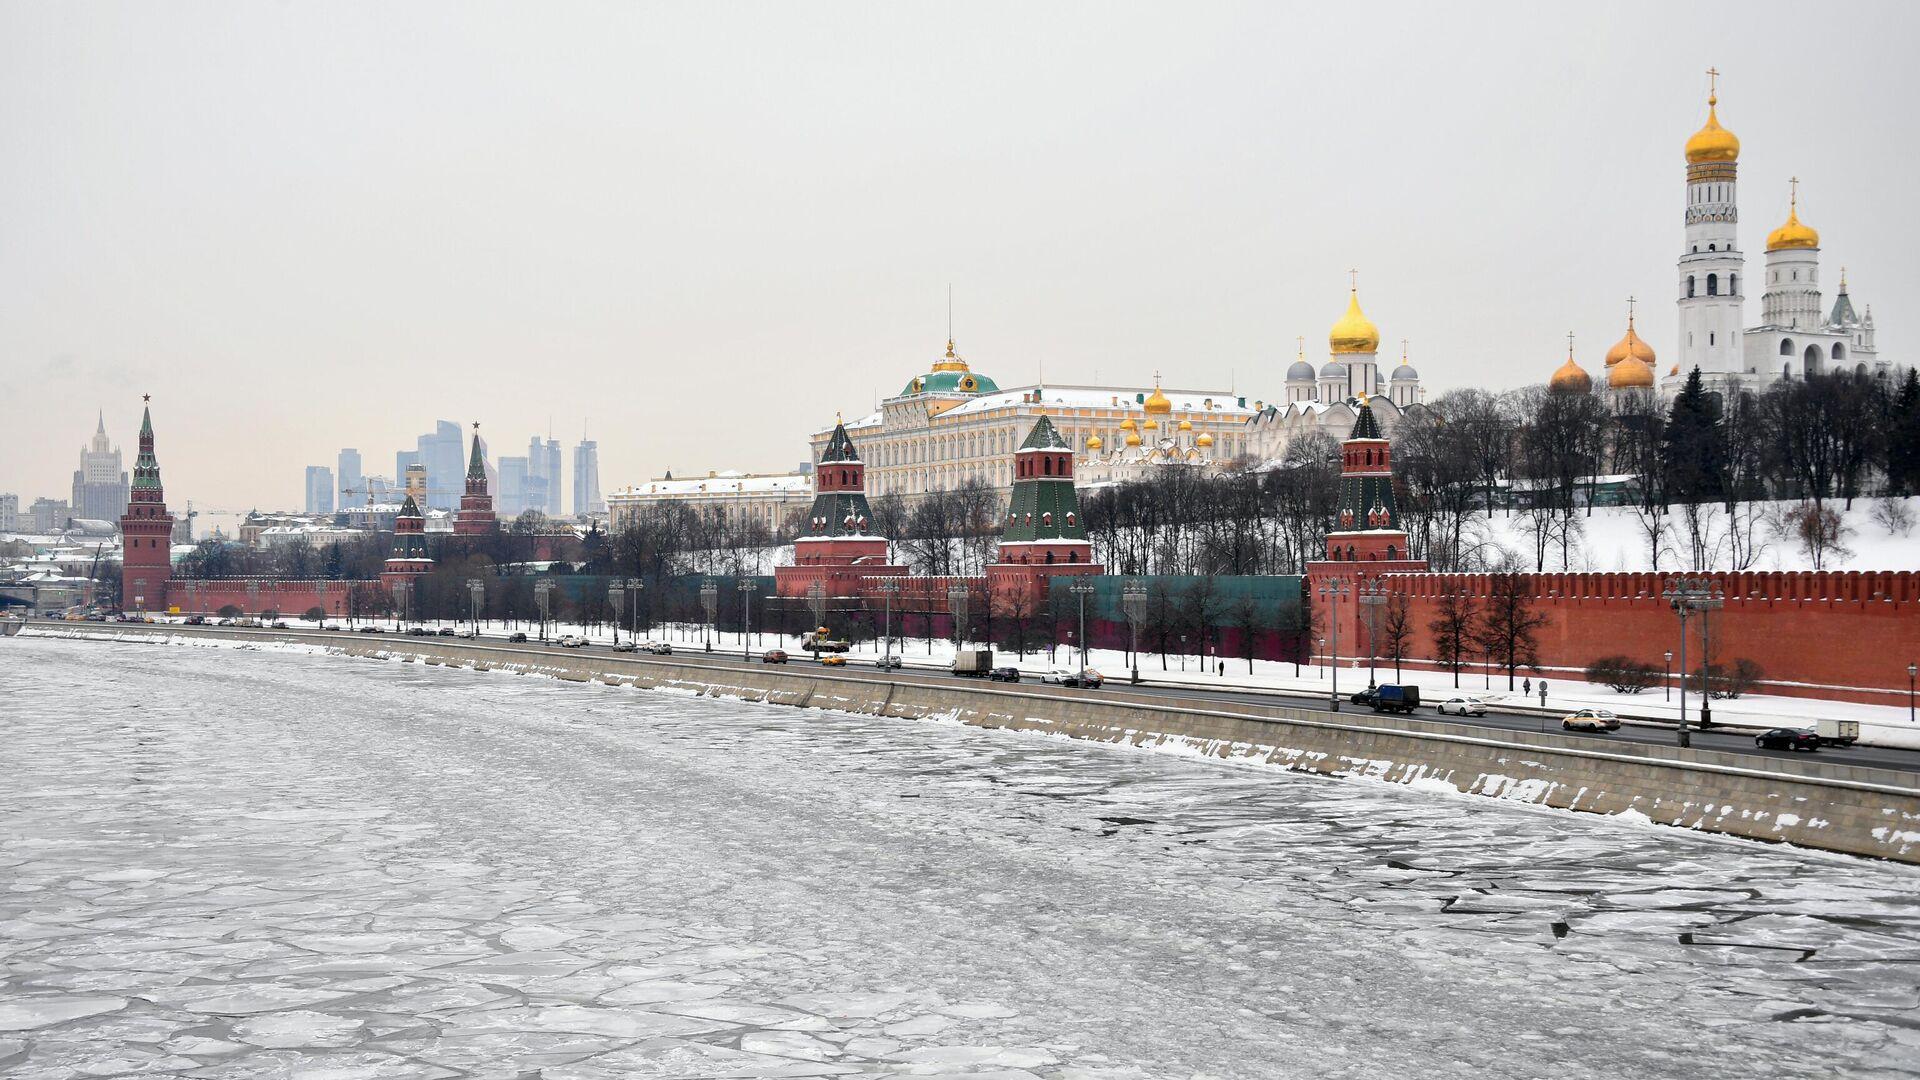 1596704150 0:117:3072:1845 1920x0 80 0 0 7ffa9b3b67cff60c55ec7c13147d6ddb - В России одобрили дорожную карту по развитию спроса на микроэлектронику